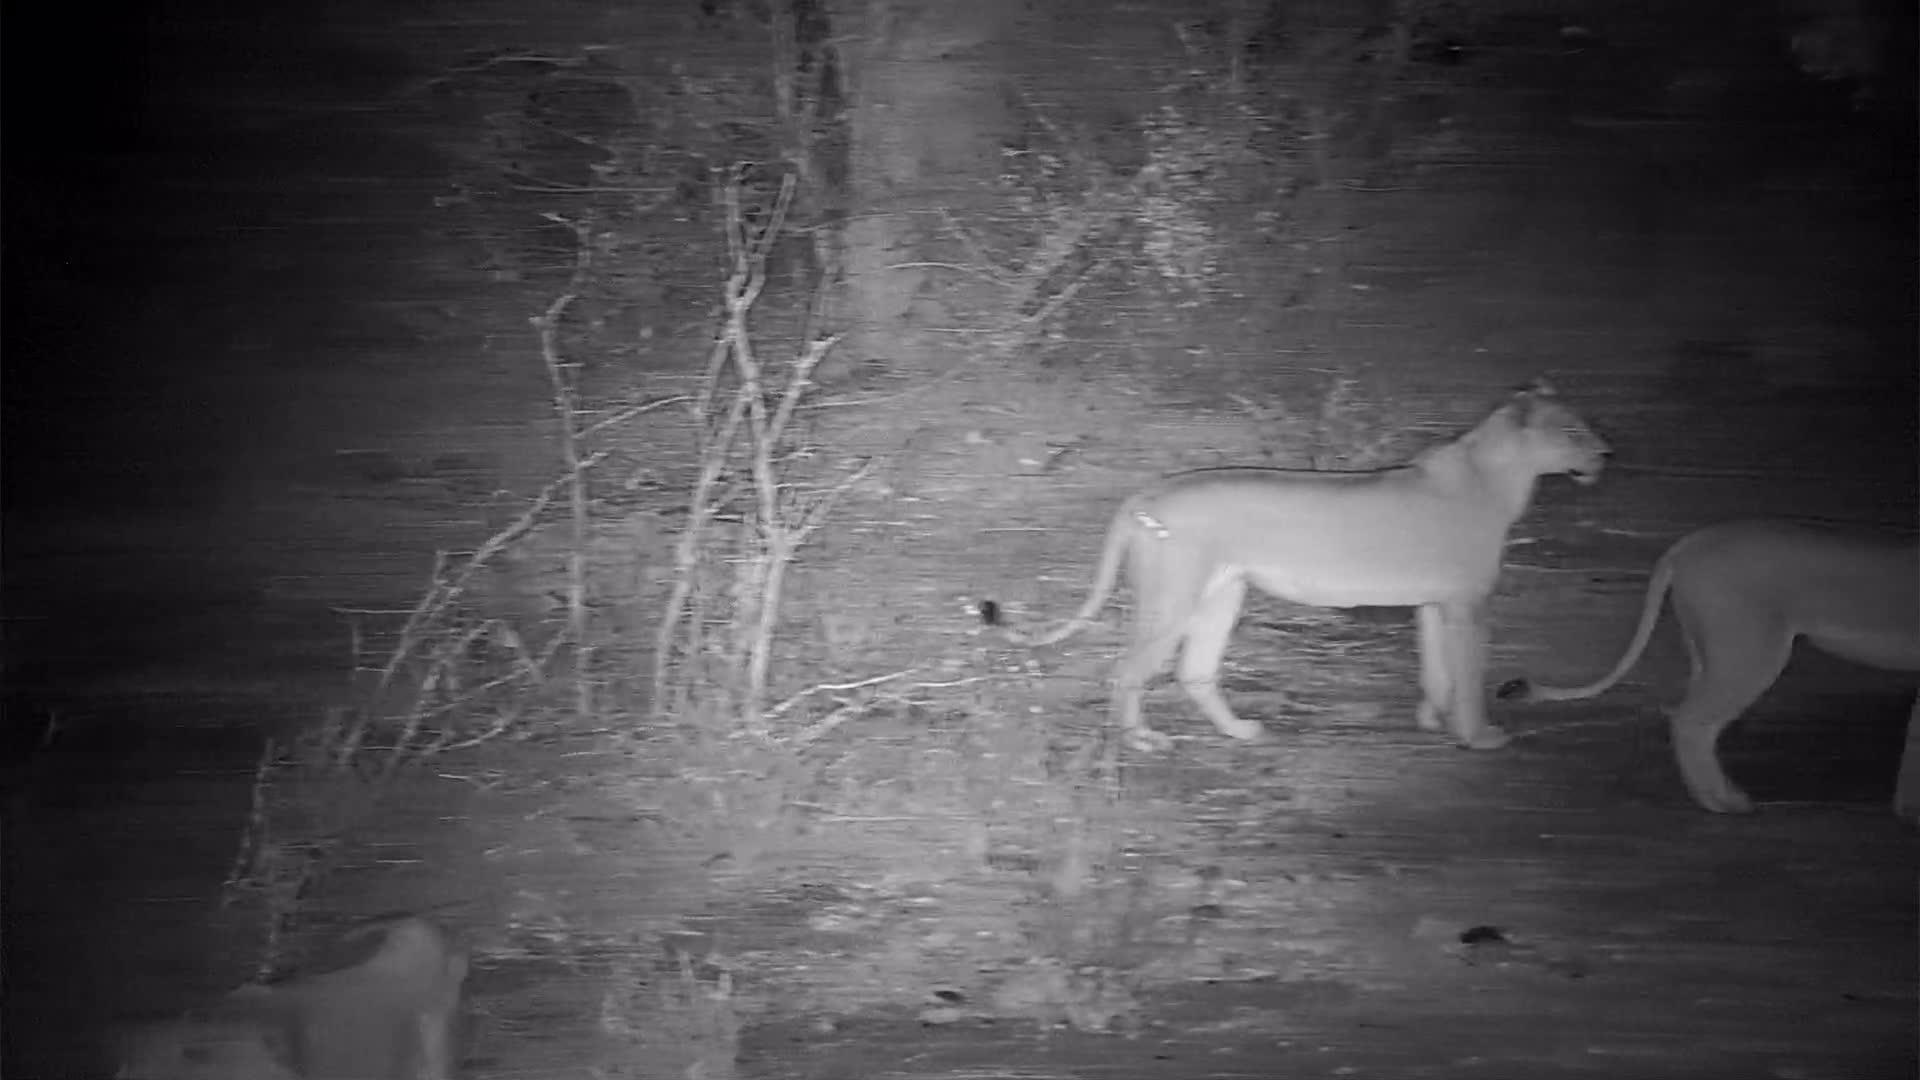 VIDEO: The Thakazile Lion Pride passing through